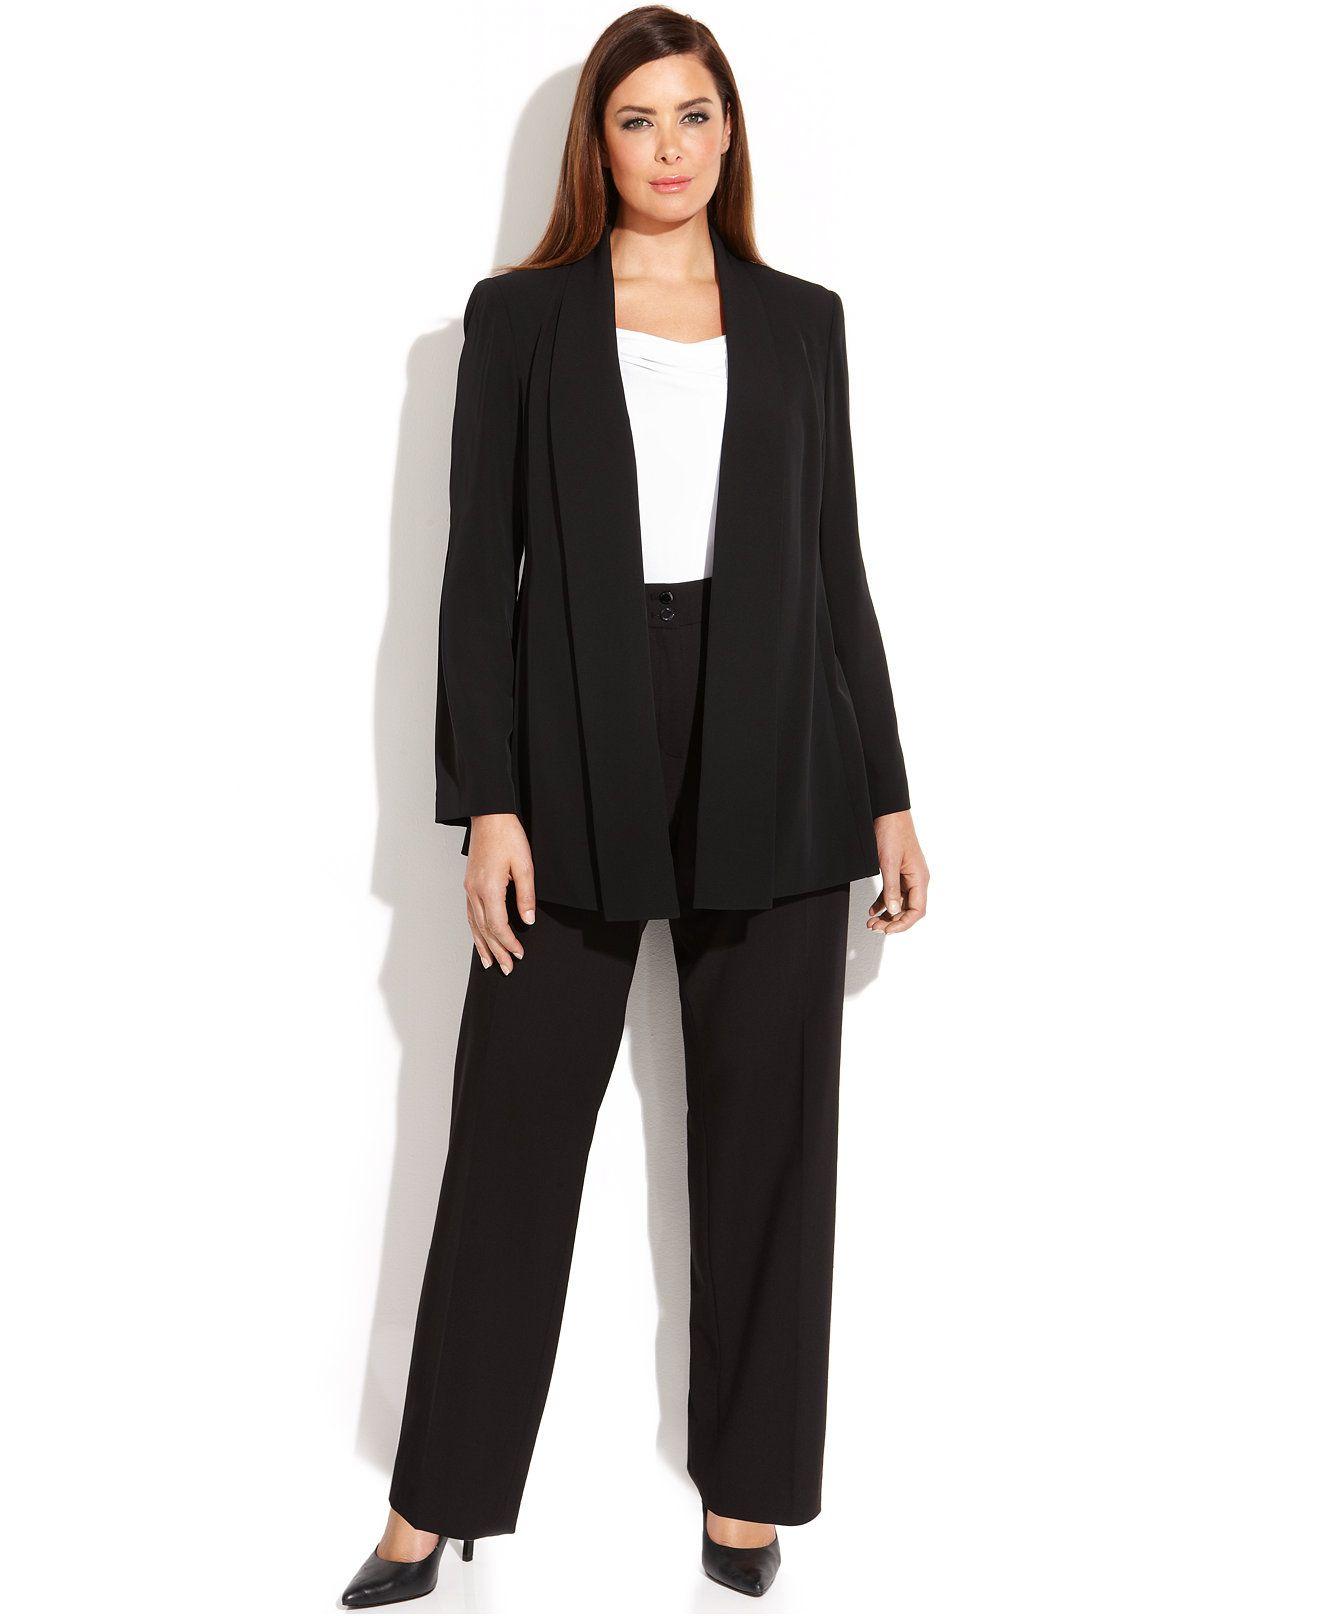 Calvin Klein Plus Size Soft Jacket Cowl Neck Top Wide Leg Dress